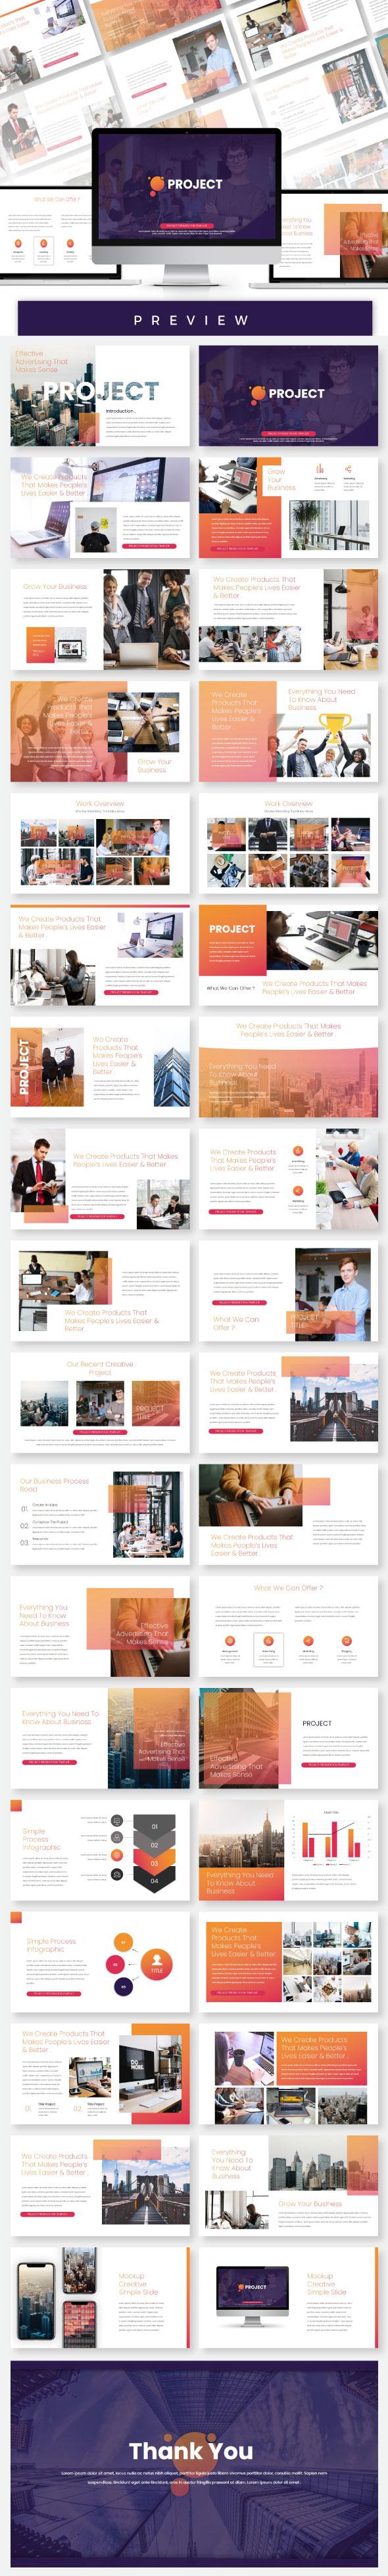 Project - Presentation Templates